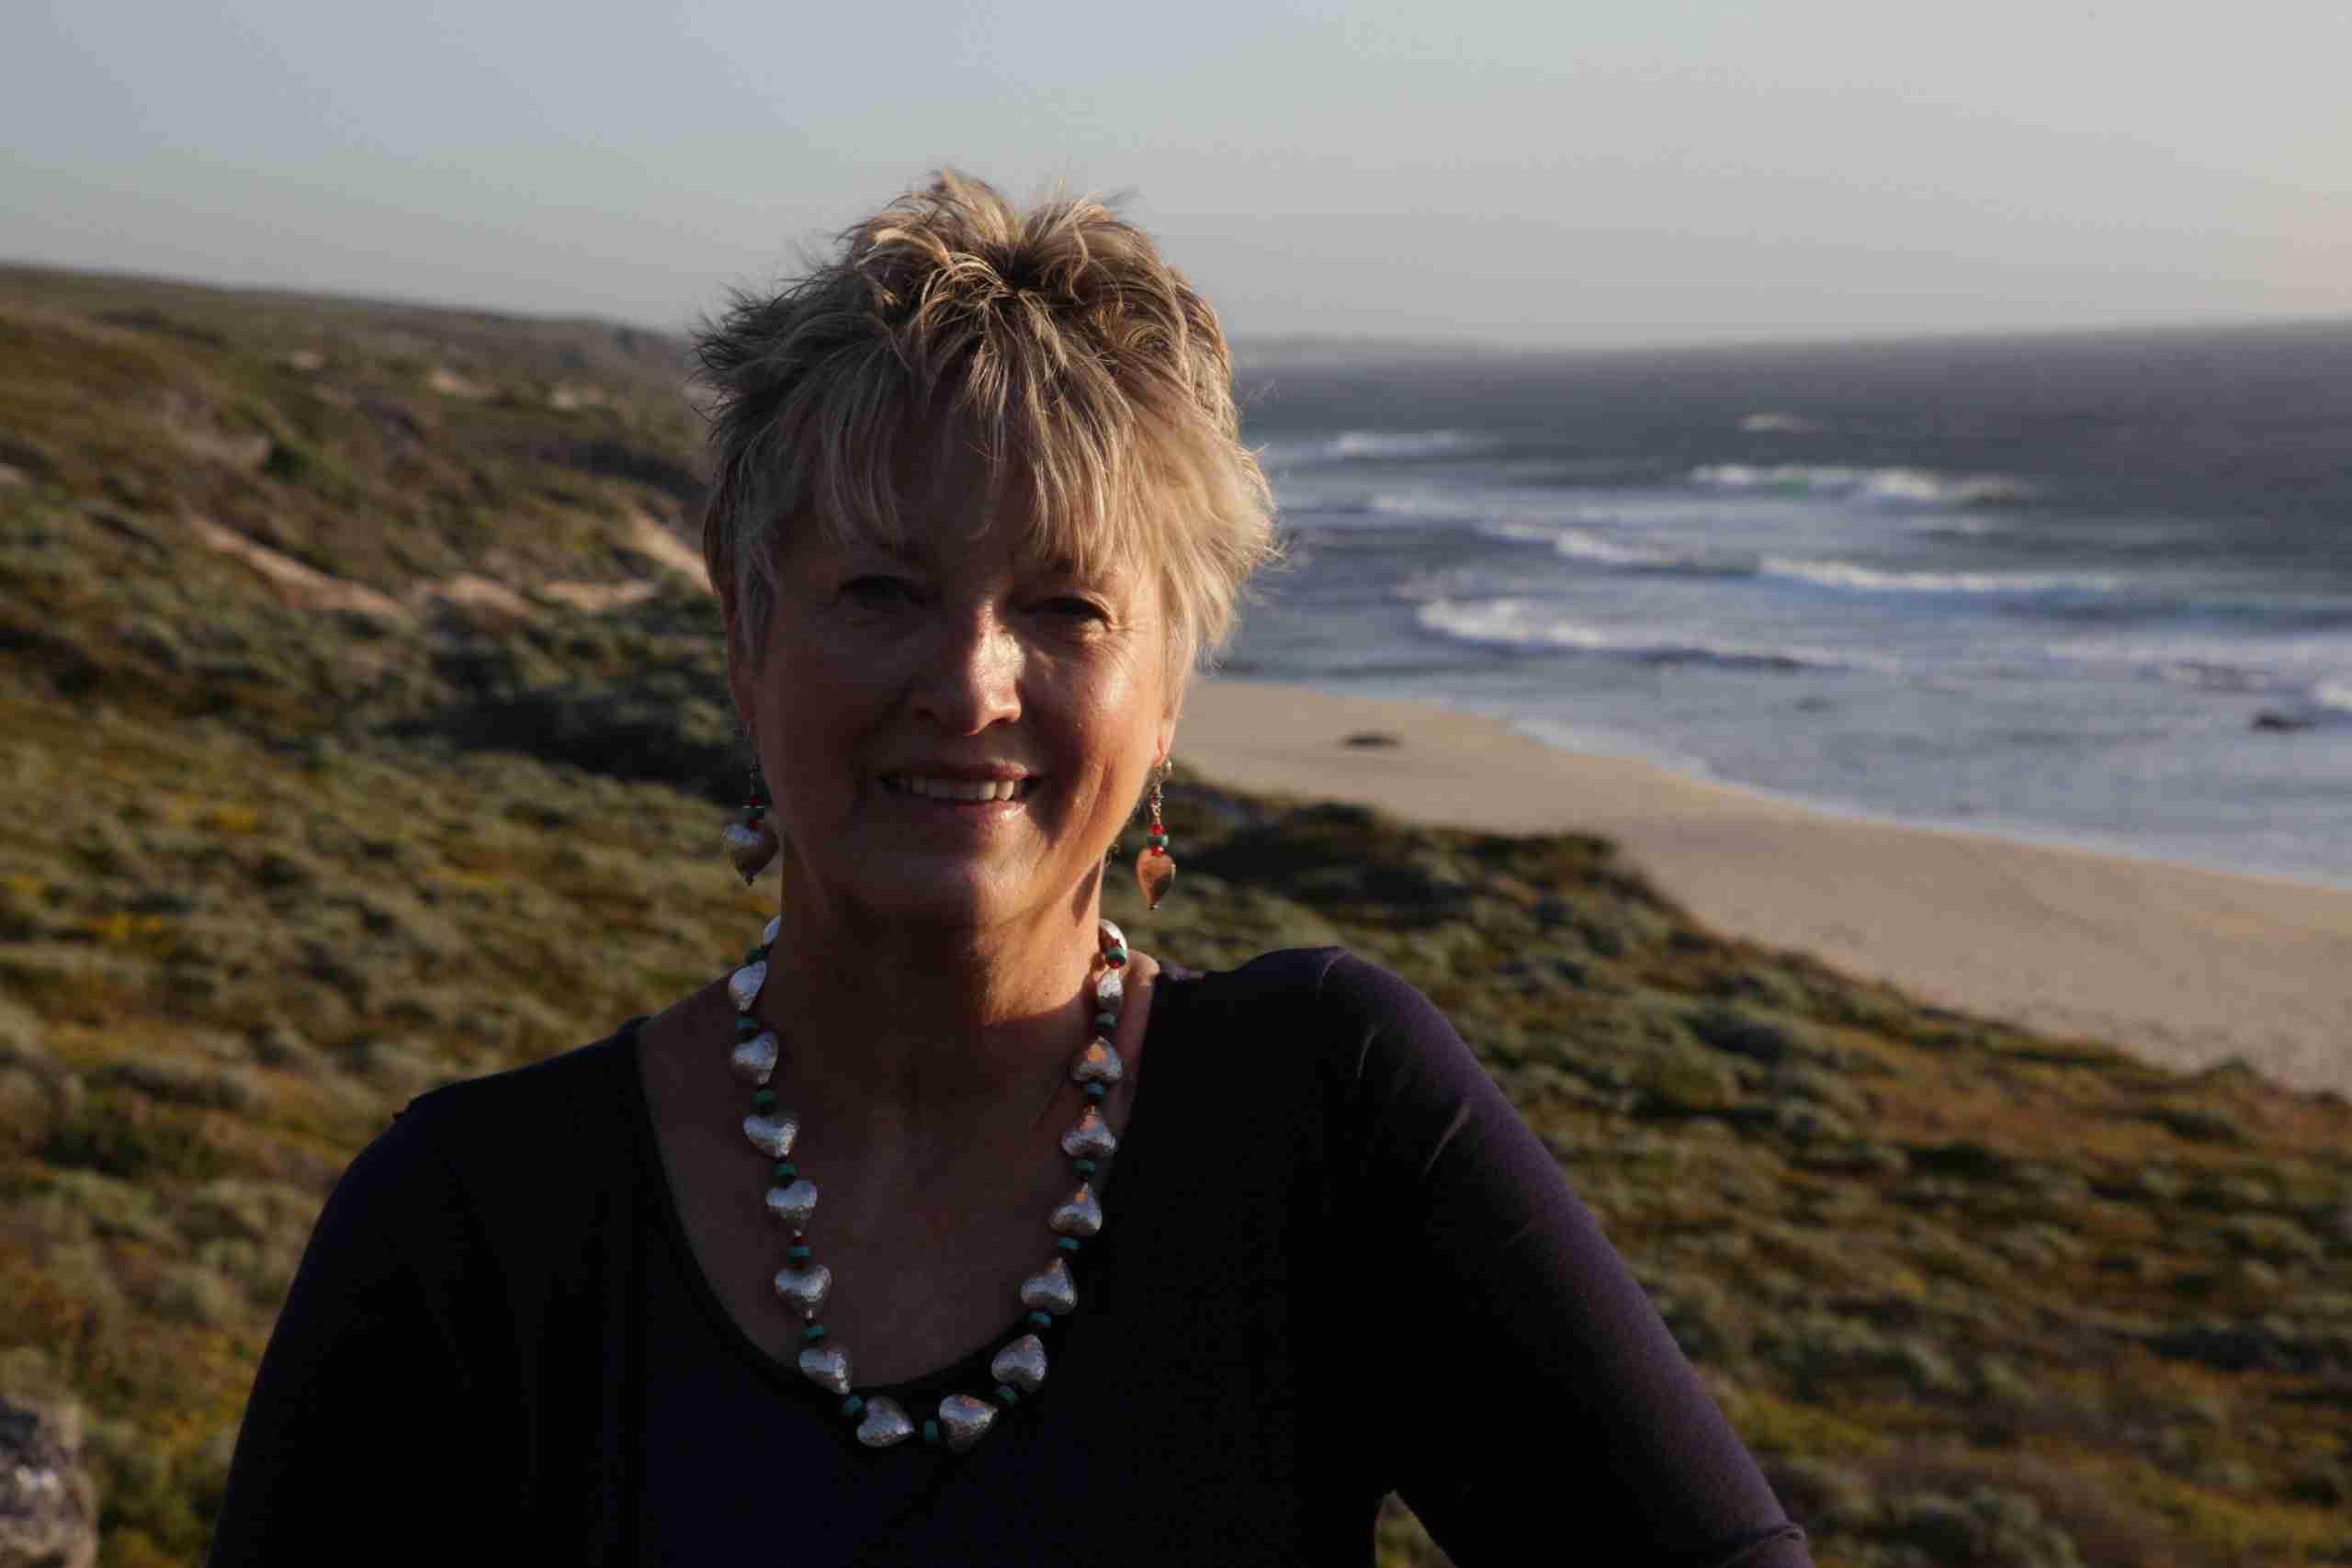 marnie clark breast health coach